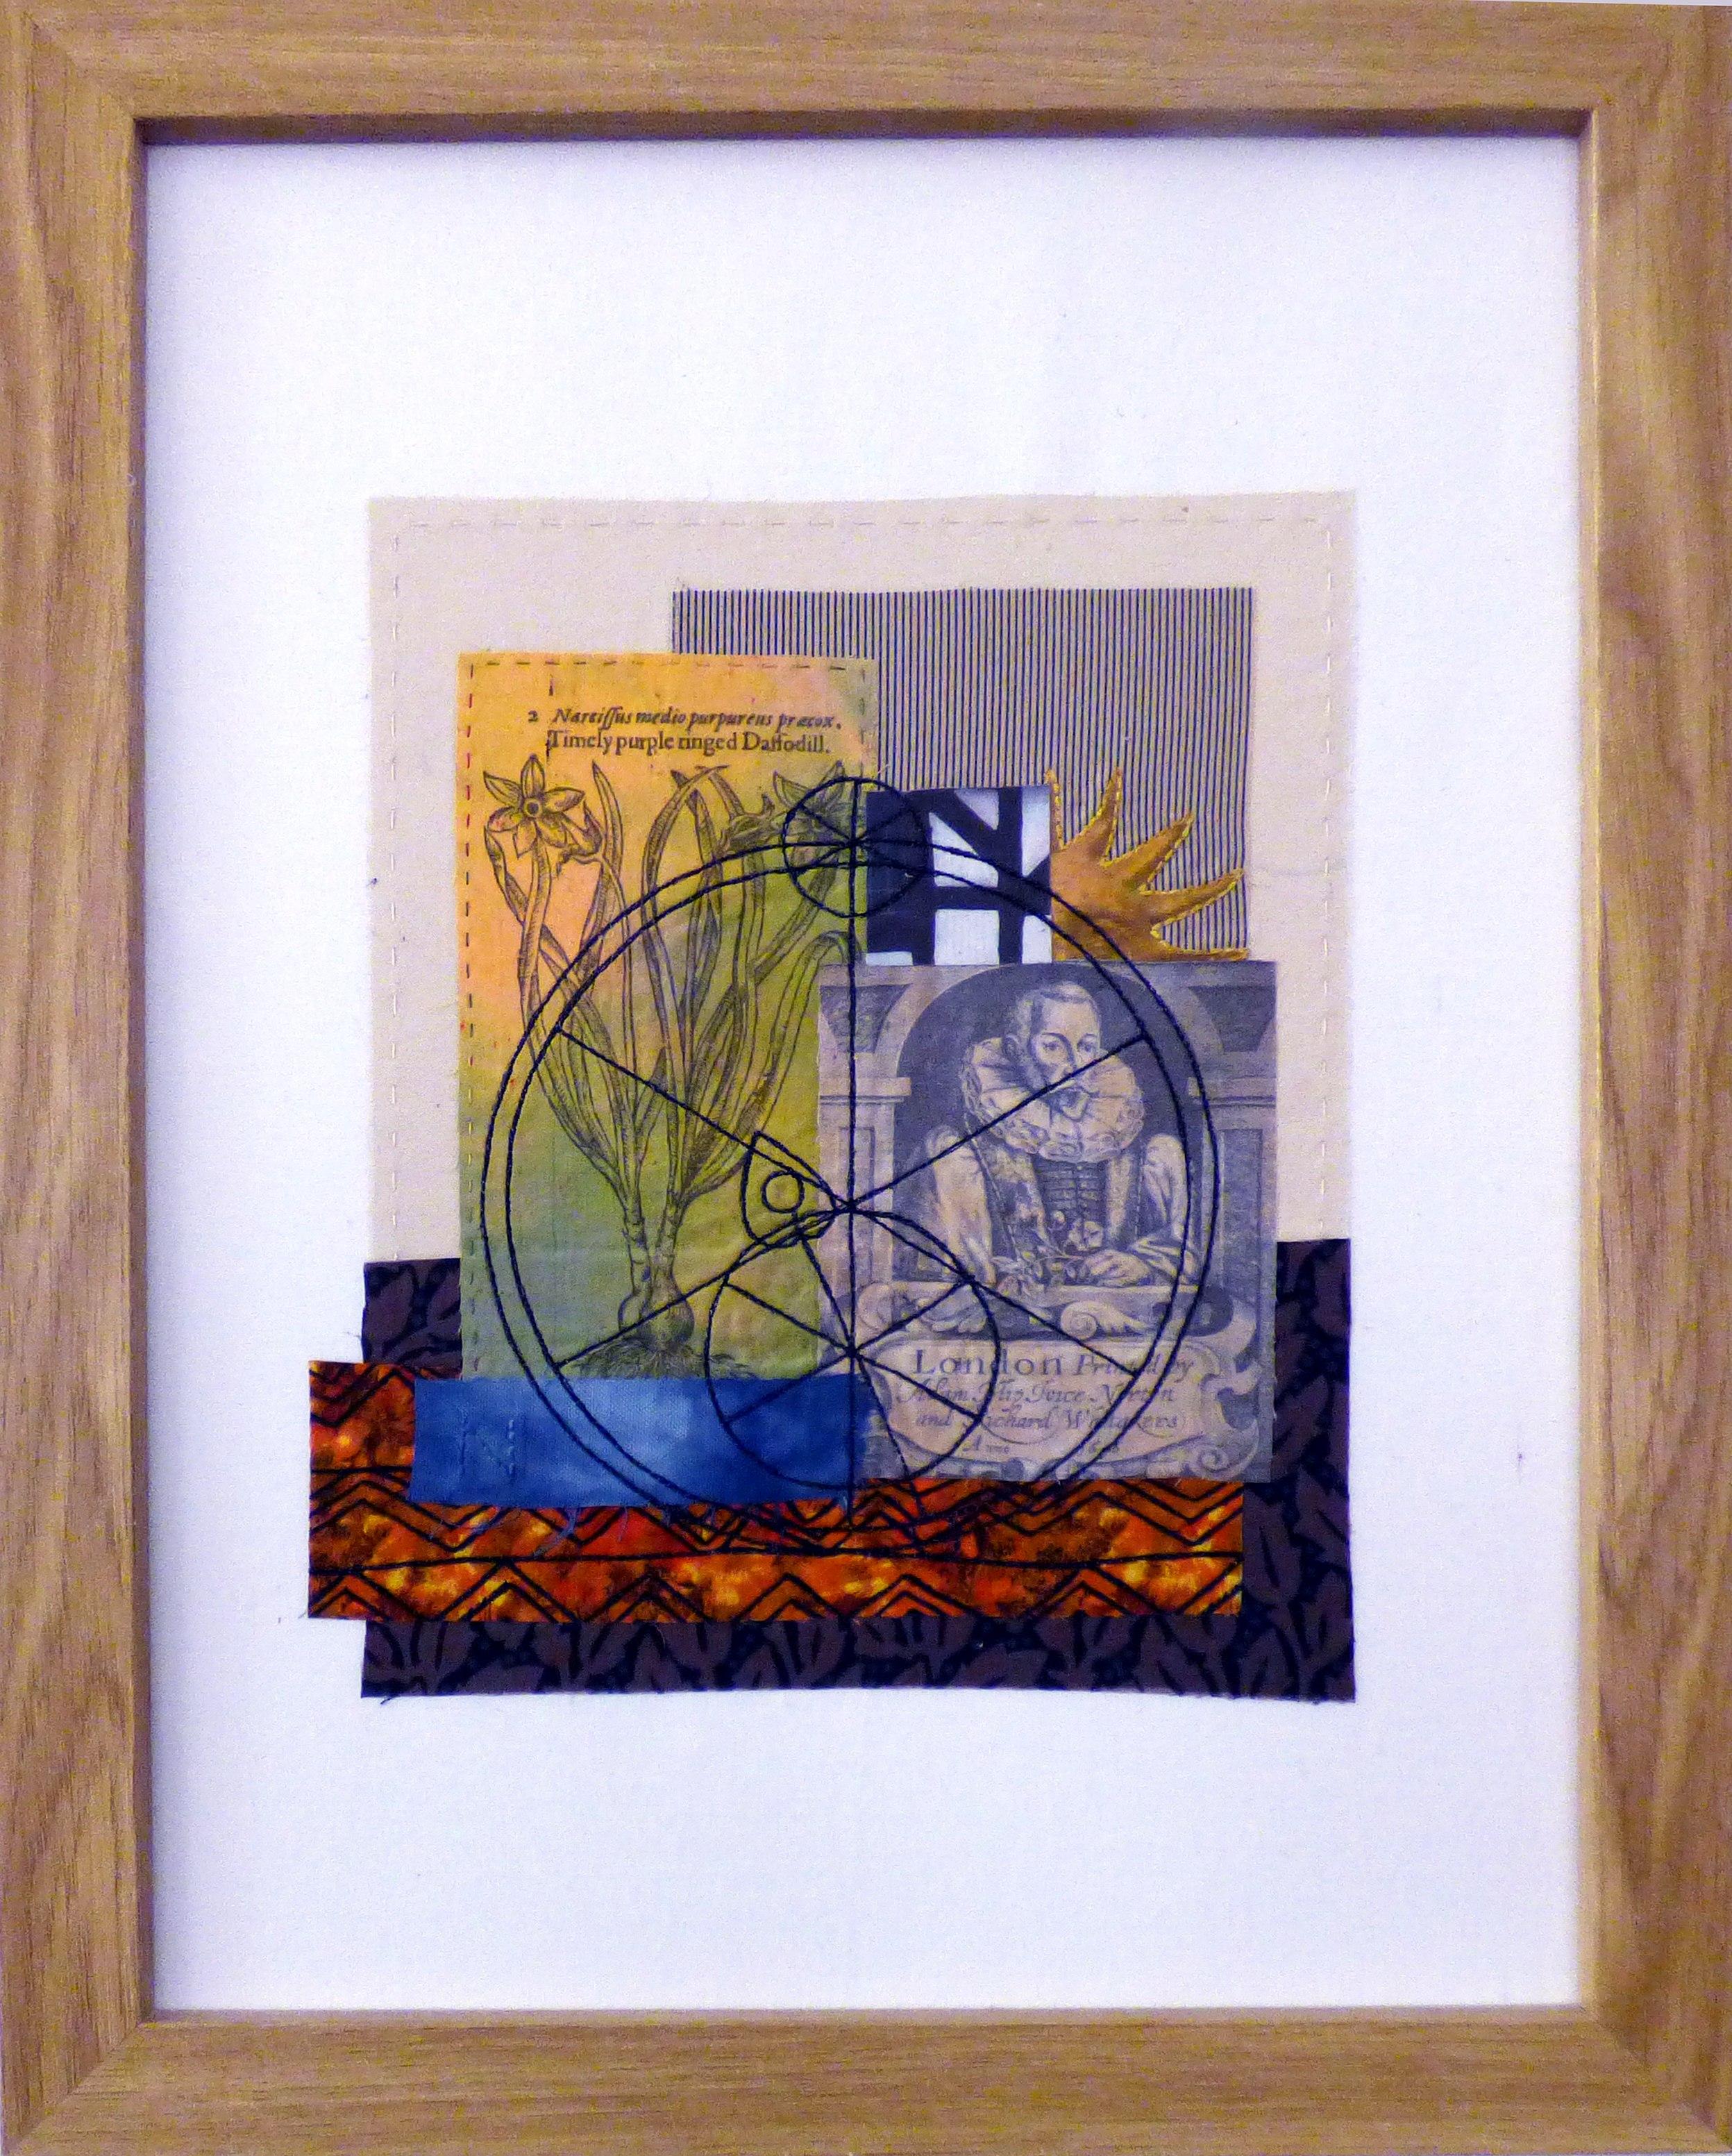 REFLECTIONS OF THE PAST 3 by Linda Bilsborrow, Ten Plus exhibition, Nantwich